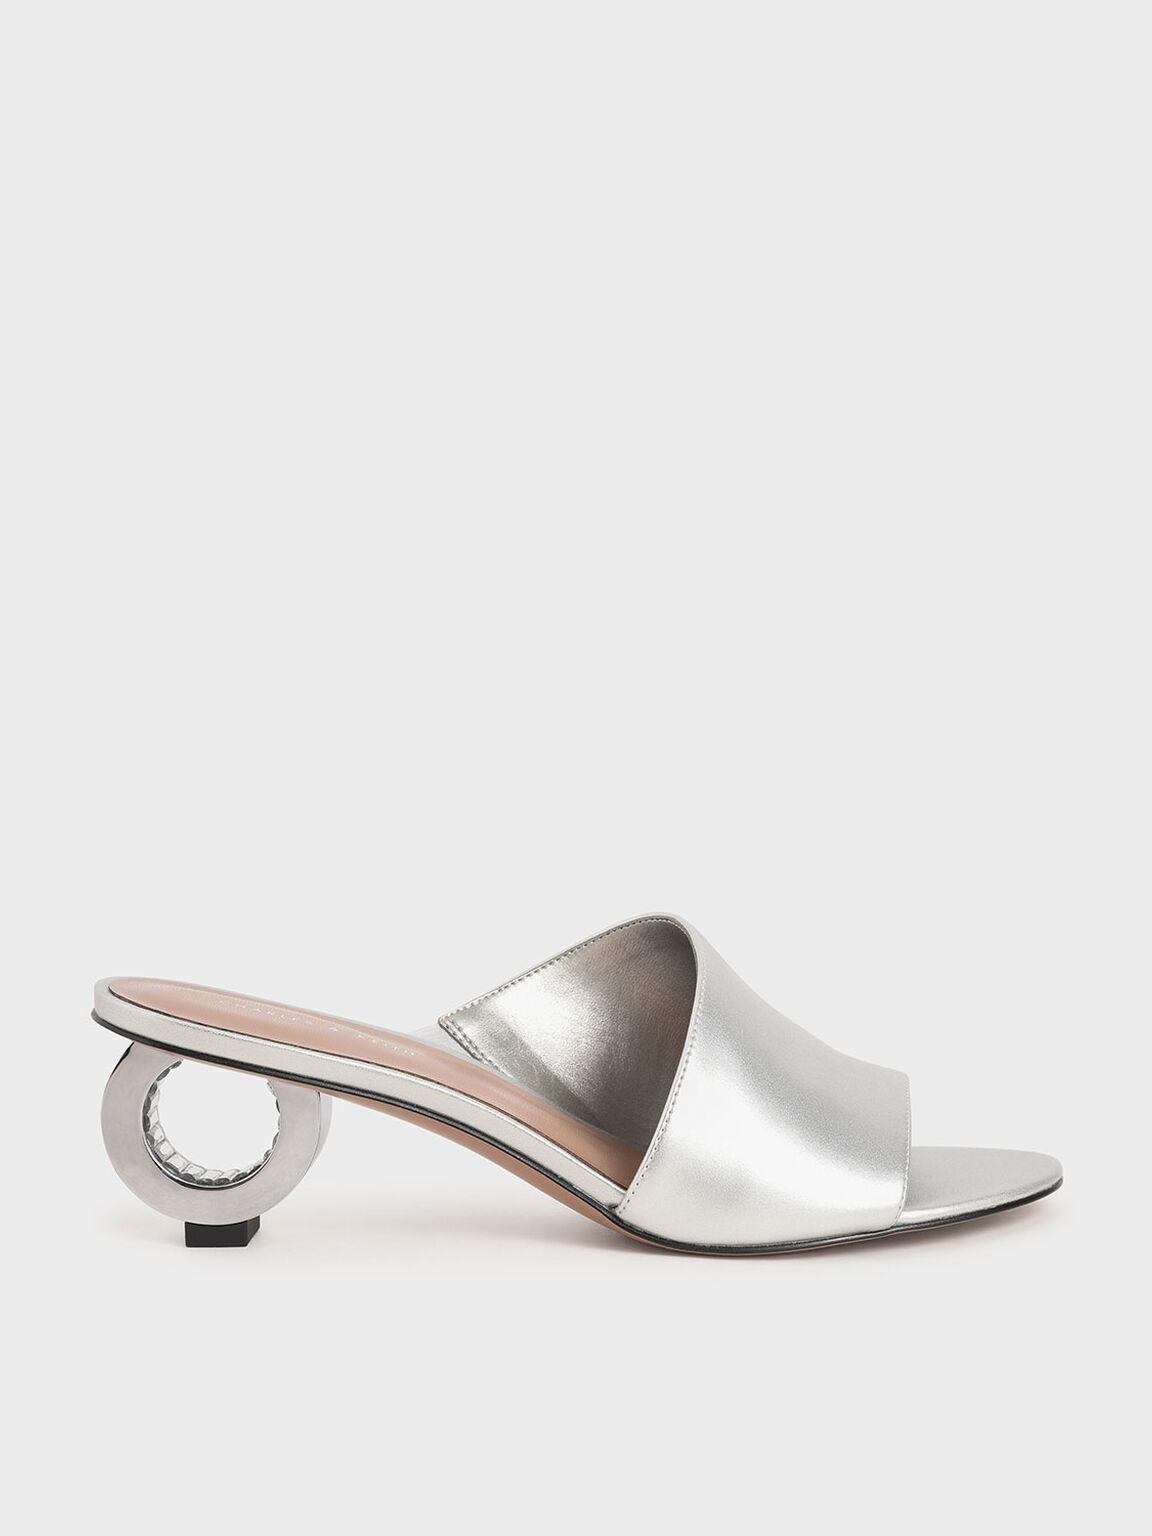 Metallic Sculptural Heel Mules, Silver, hi-res